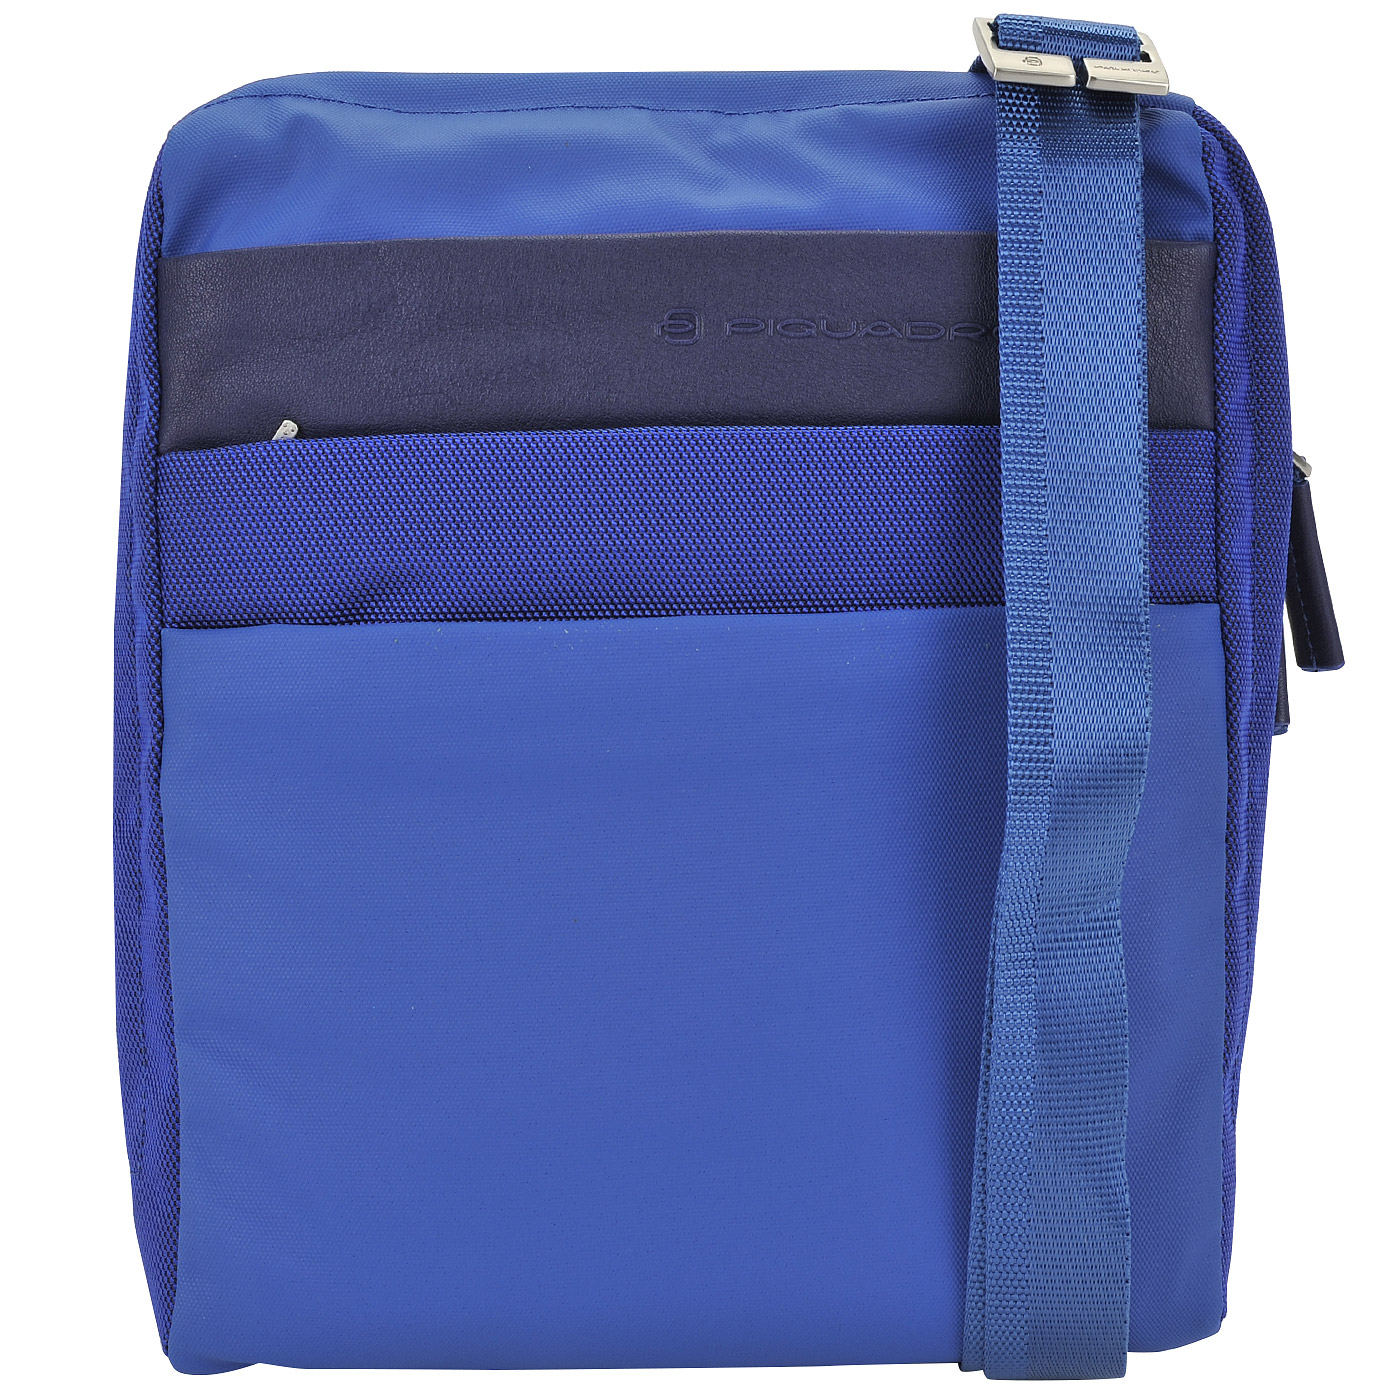 a42a7a9a1c73 Мужская сумка через плечо Piquadro Orinoco Мужская сумка через плечо  Piquadro Orinoco ...